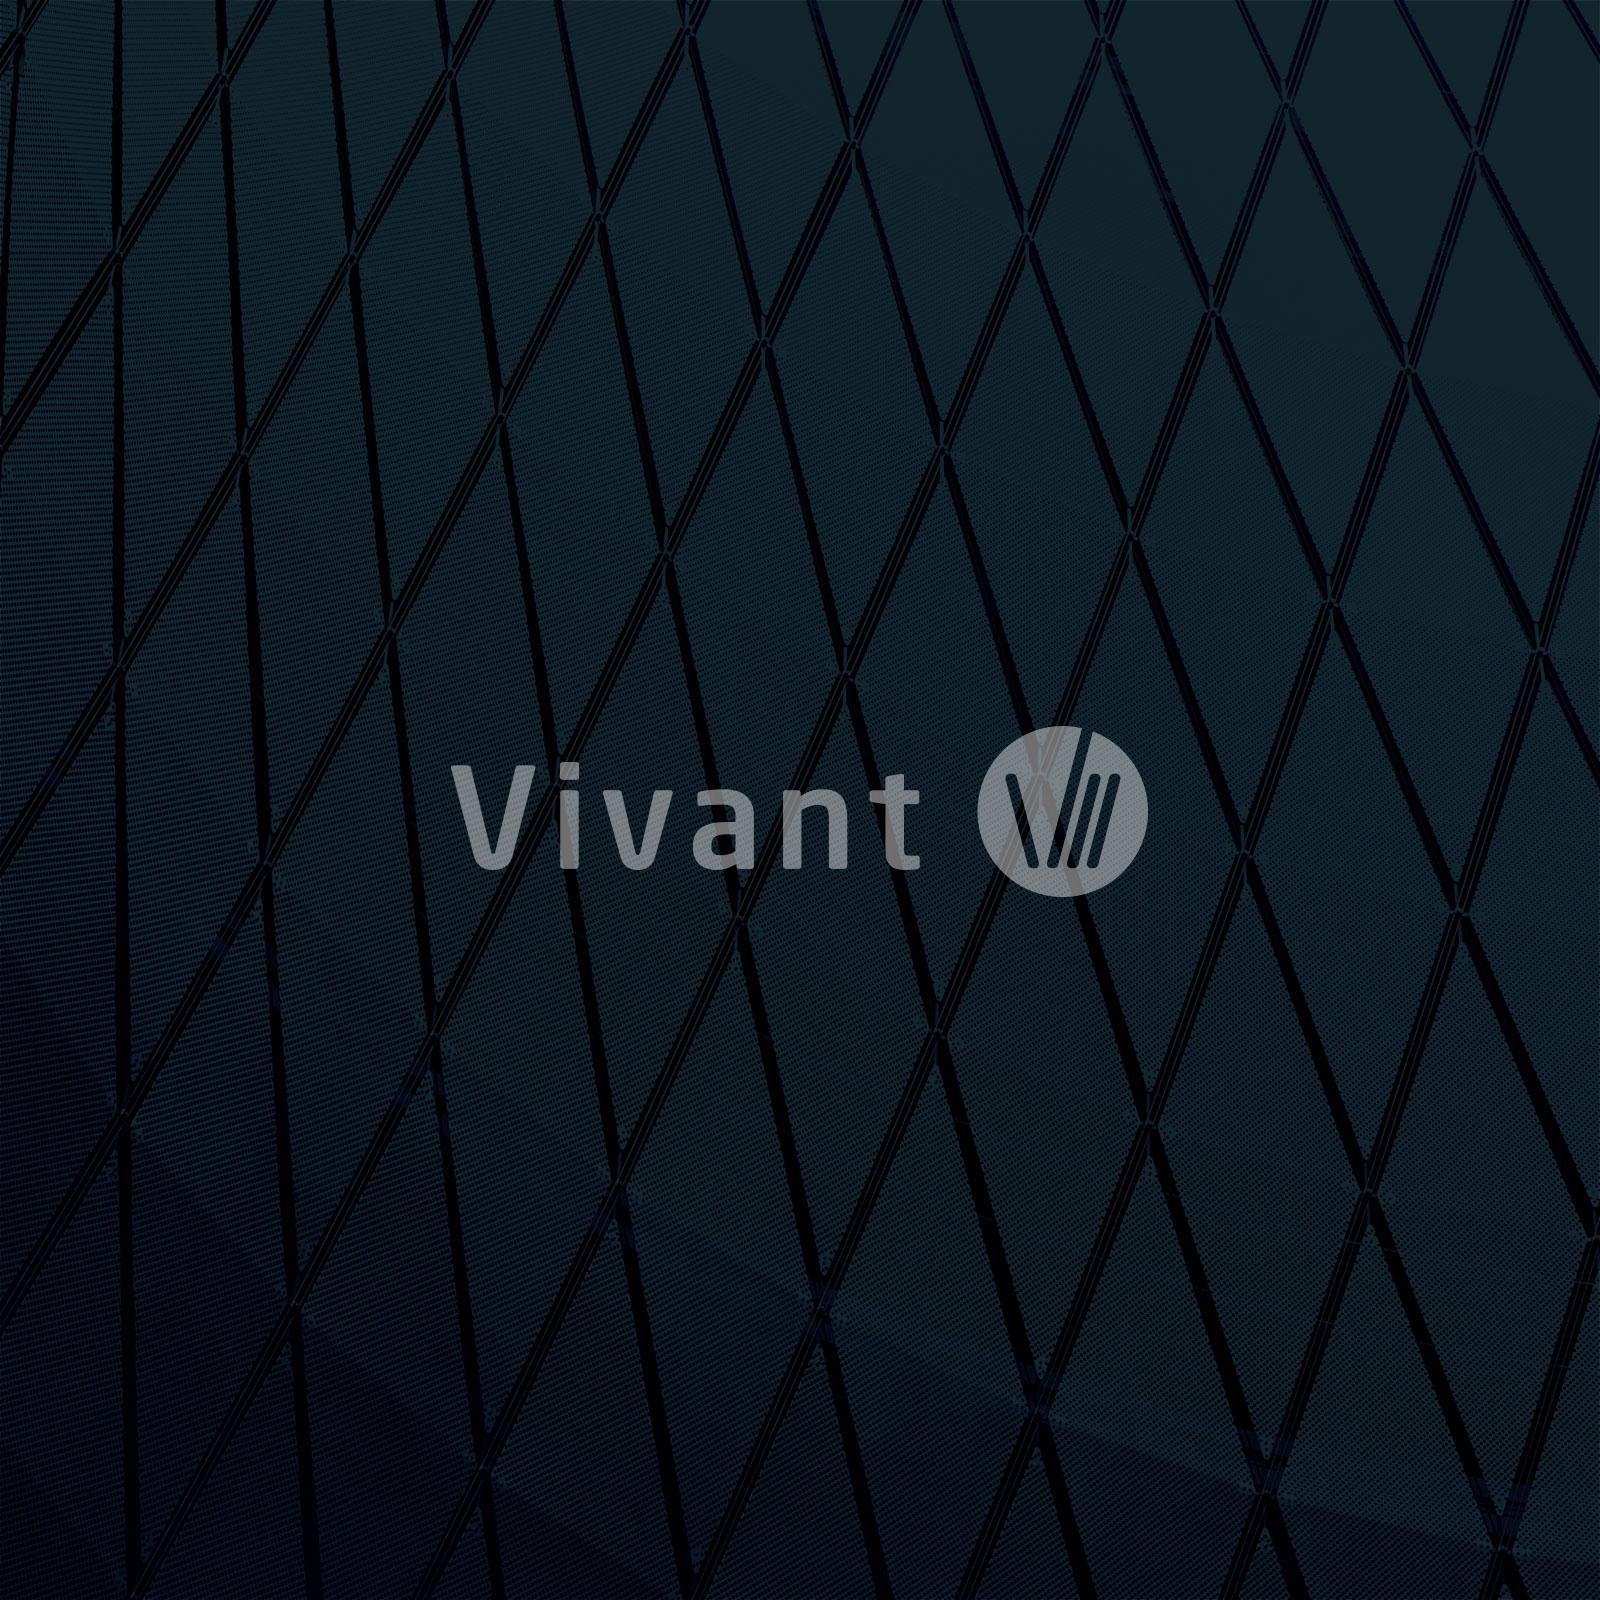 Read more about the article Vivant